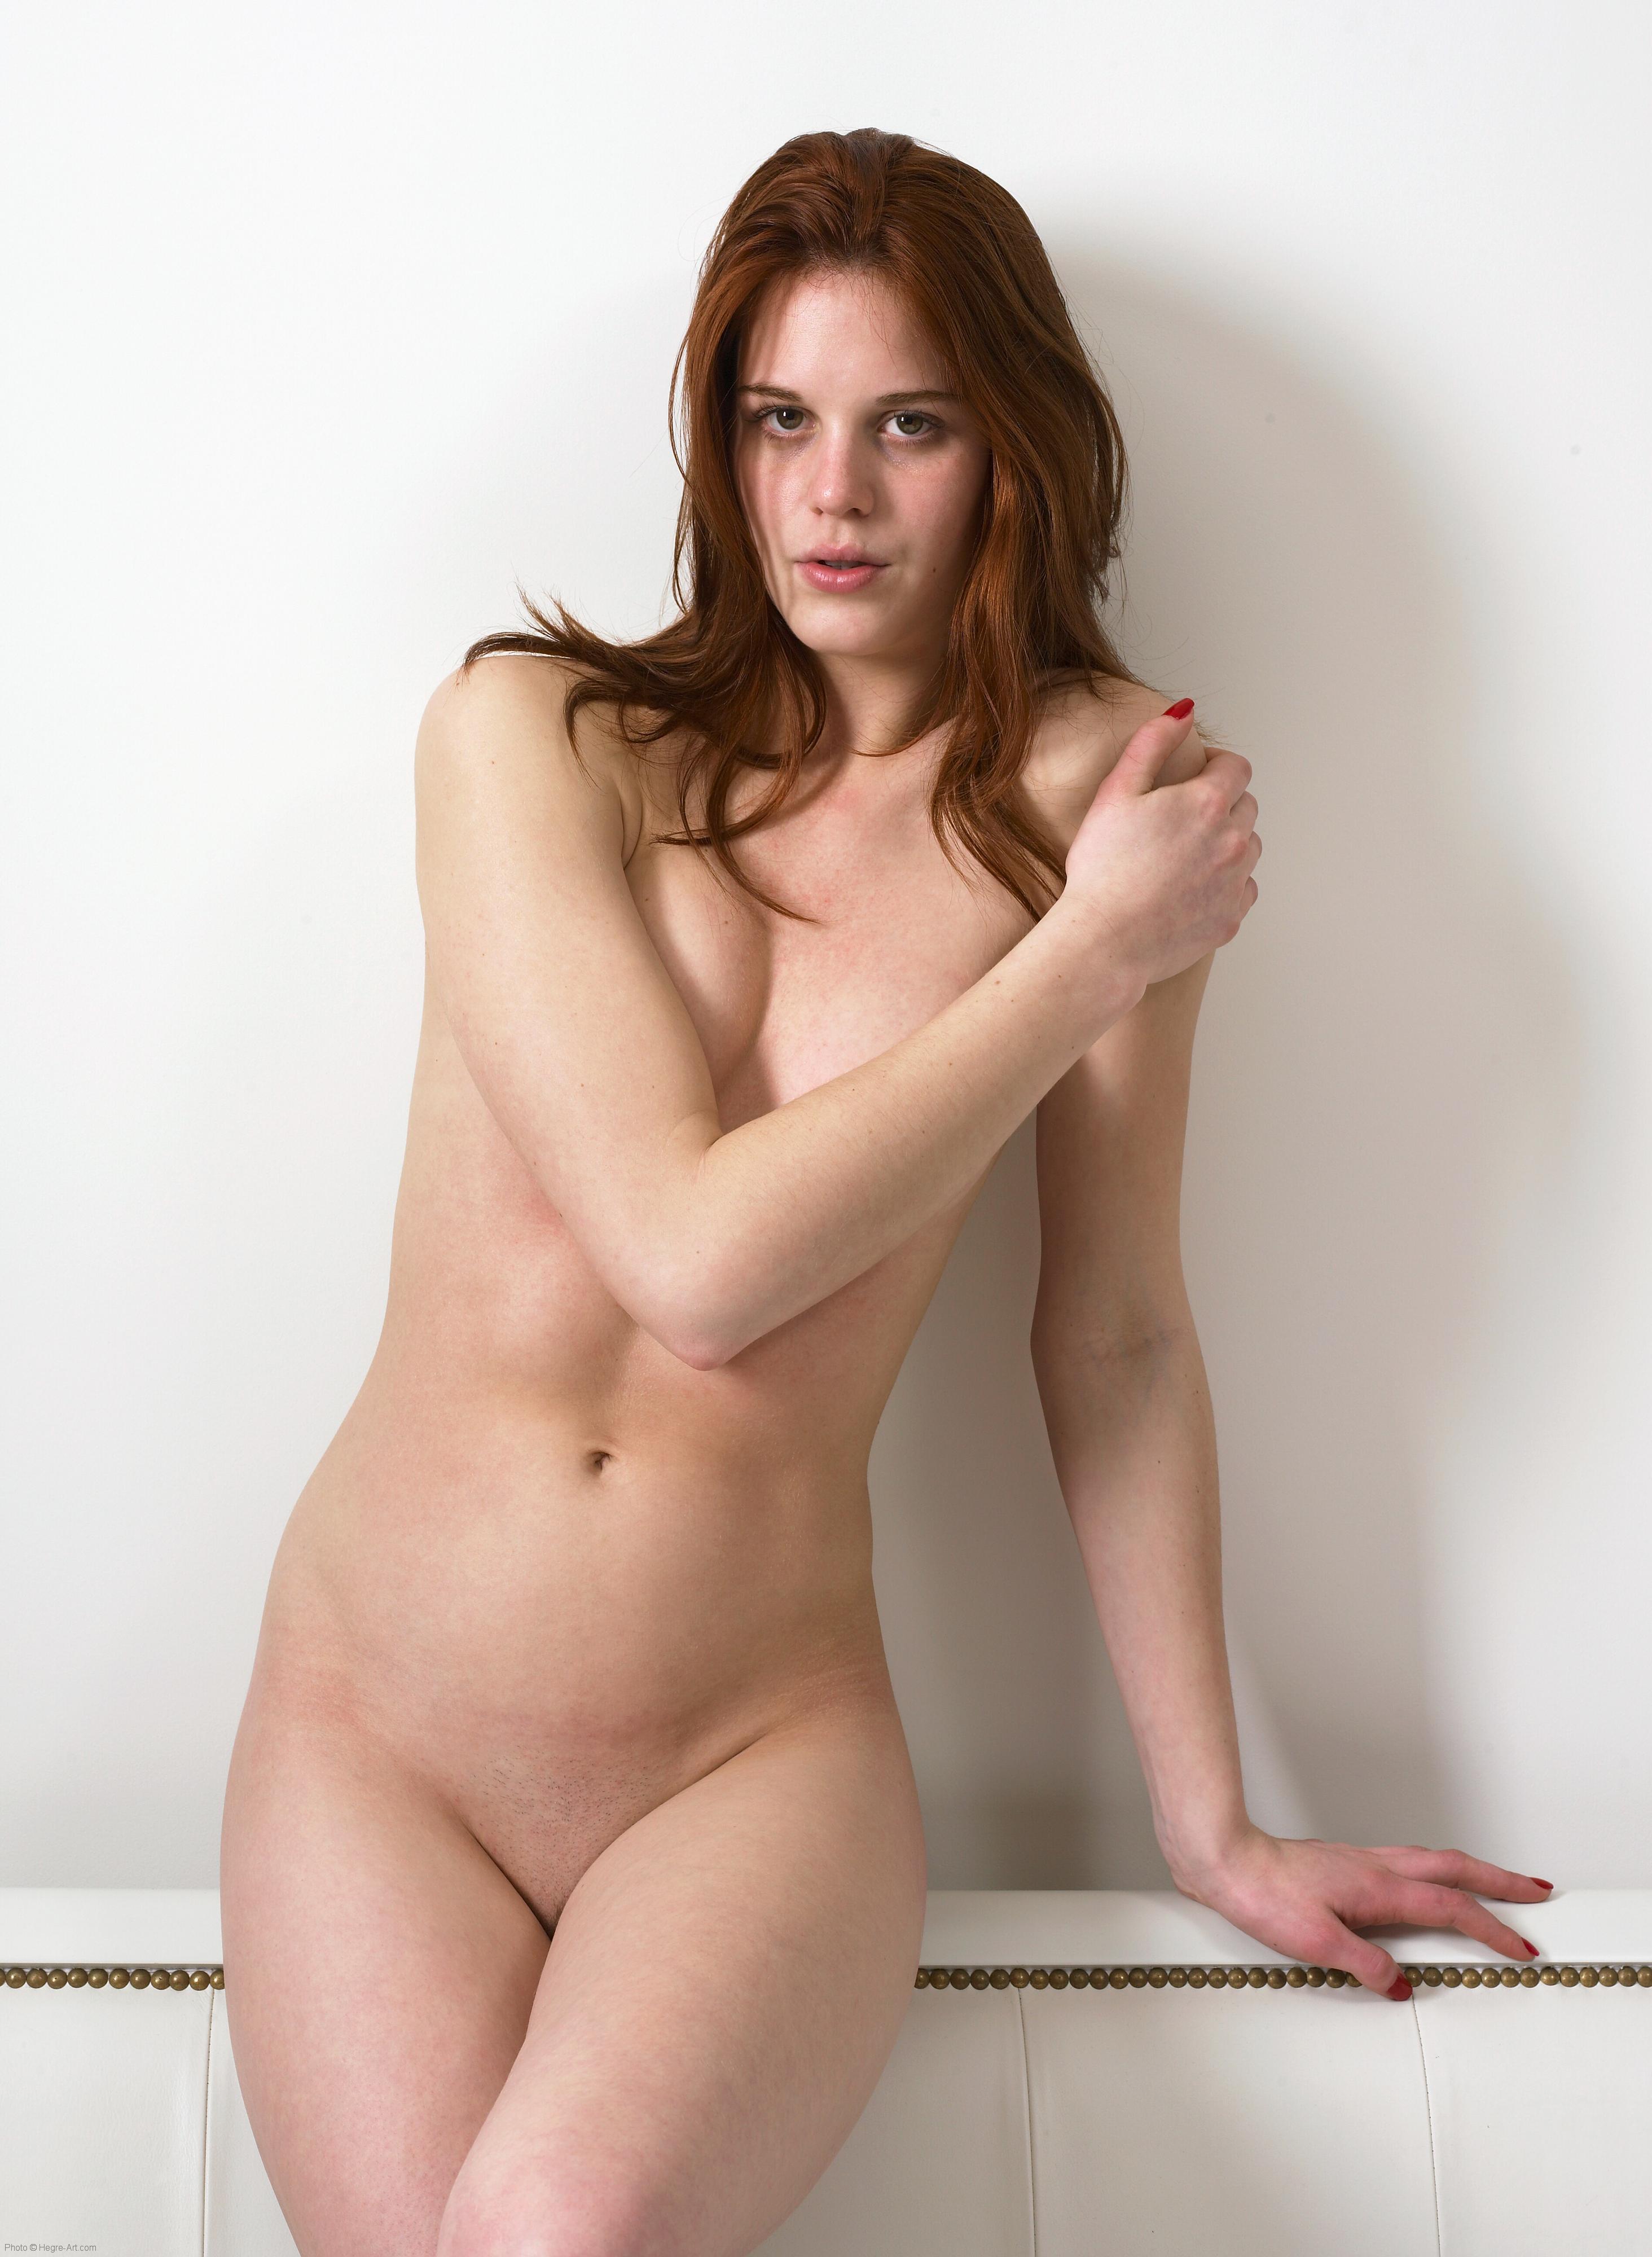 girl fucks herself outdoors nude